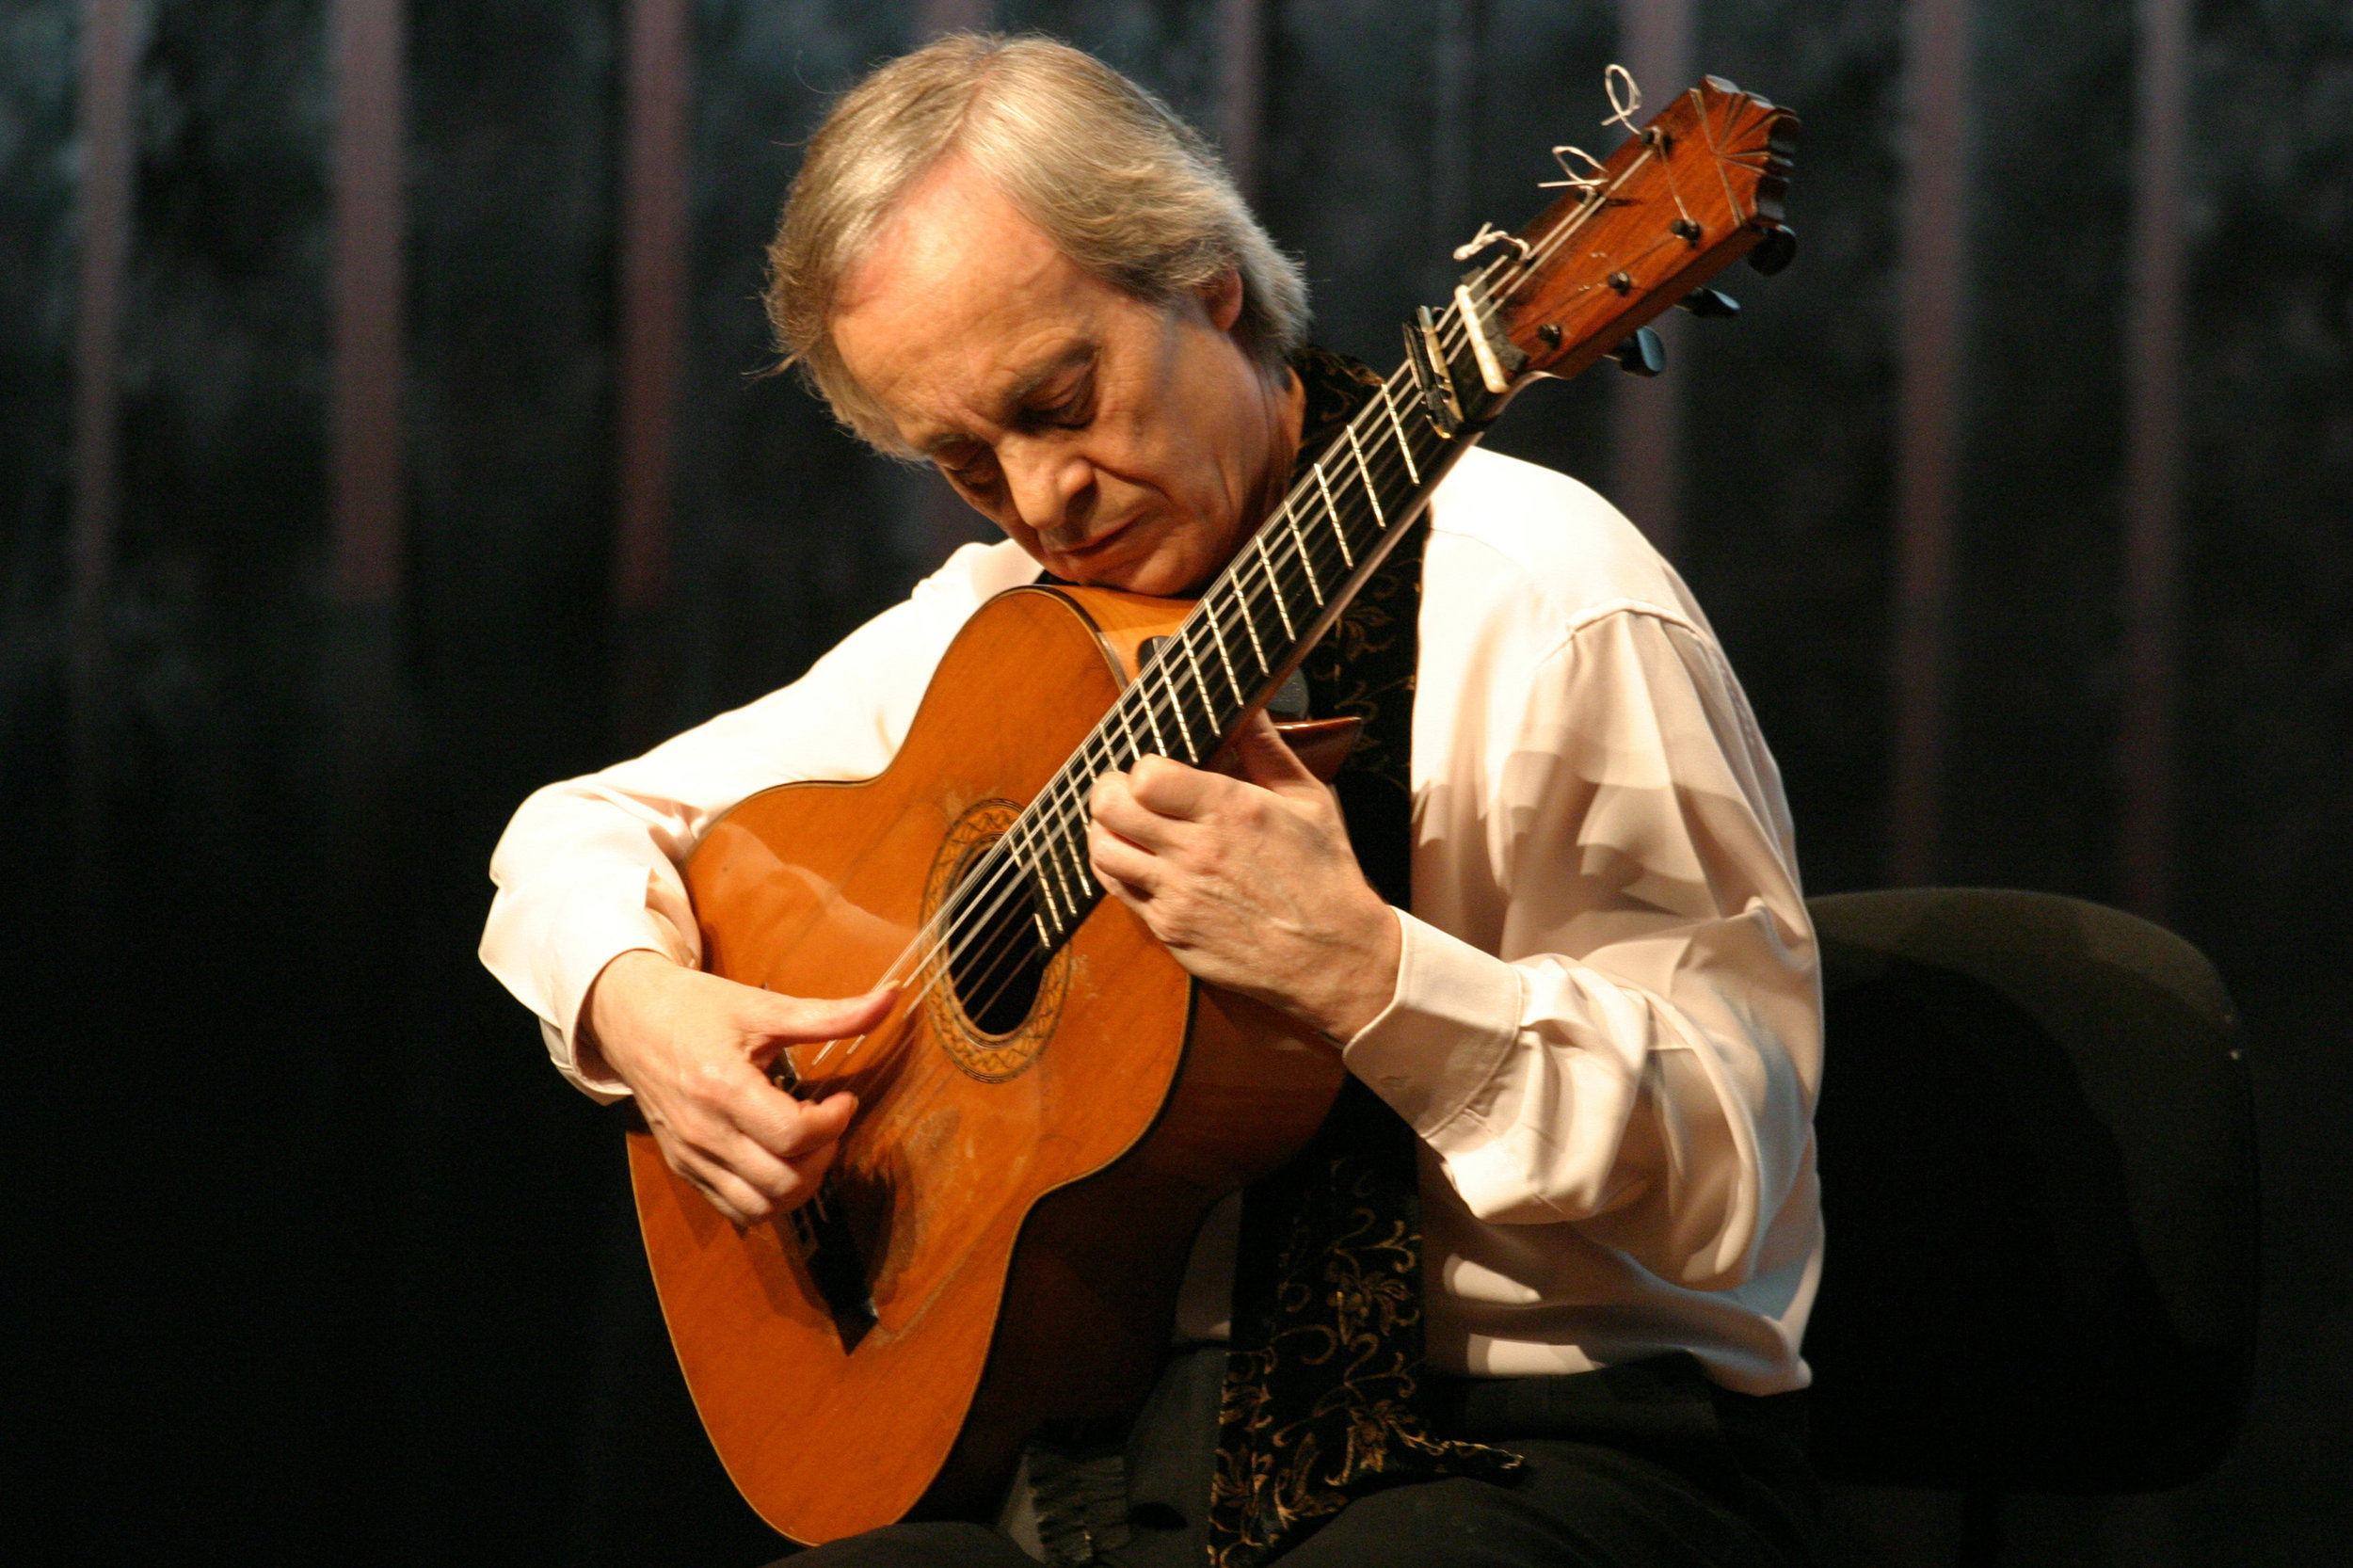 Paco Peña | Lefendary Flamenco Guitarist | 10.22